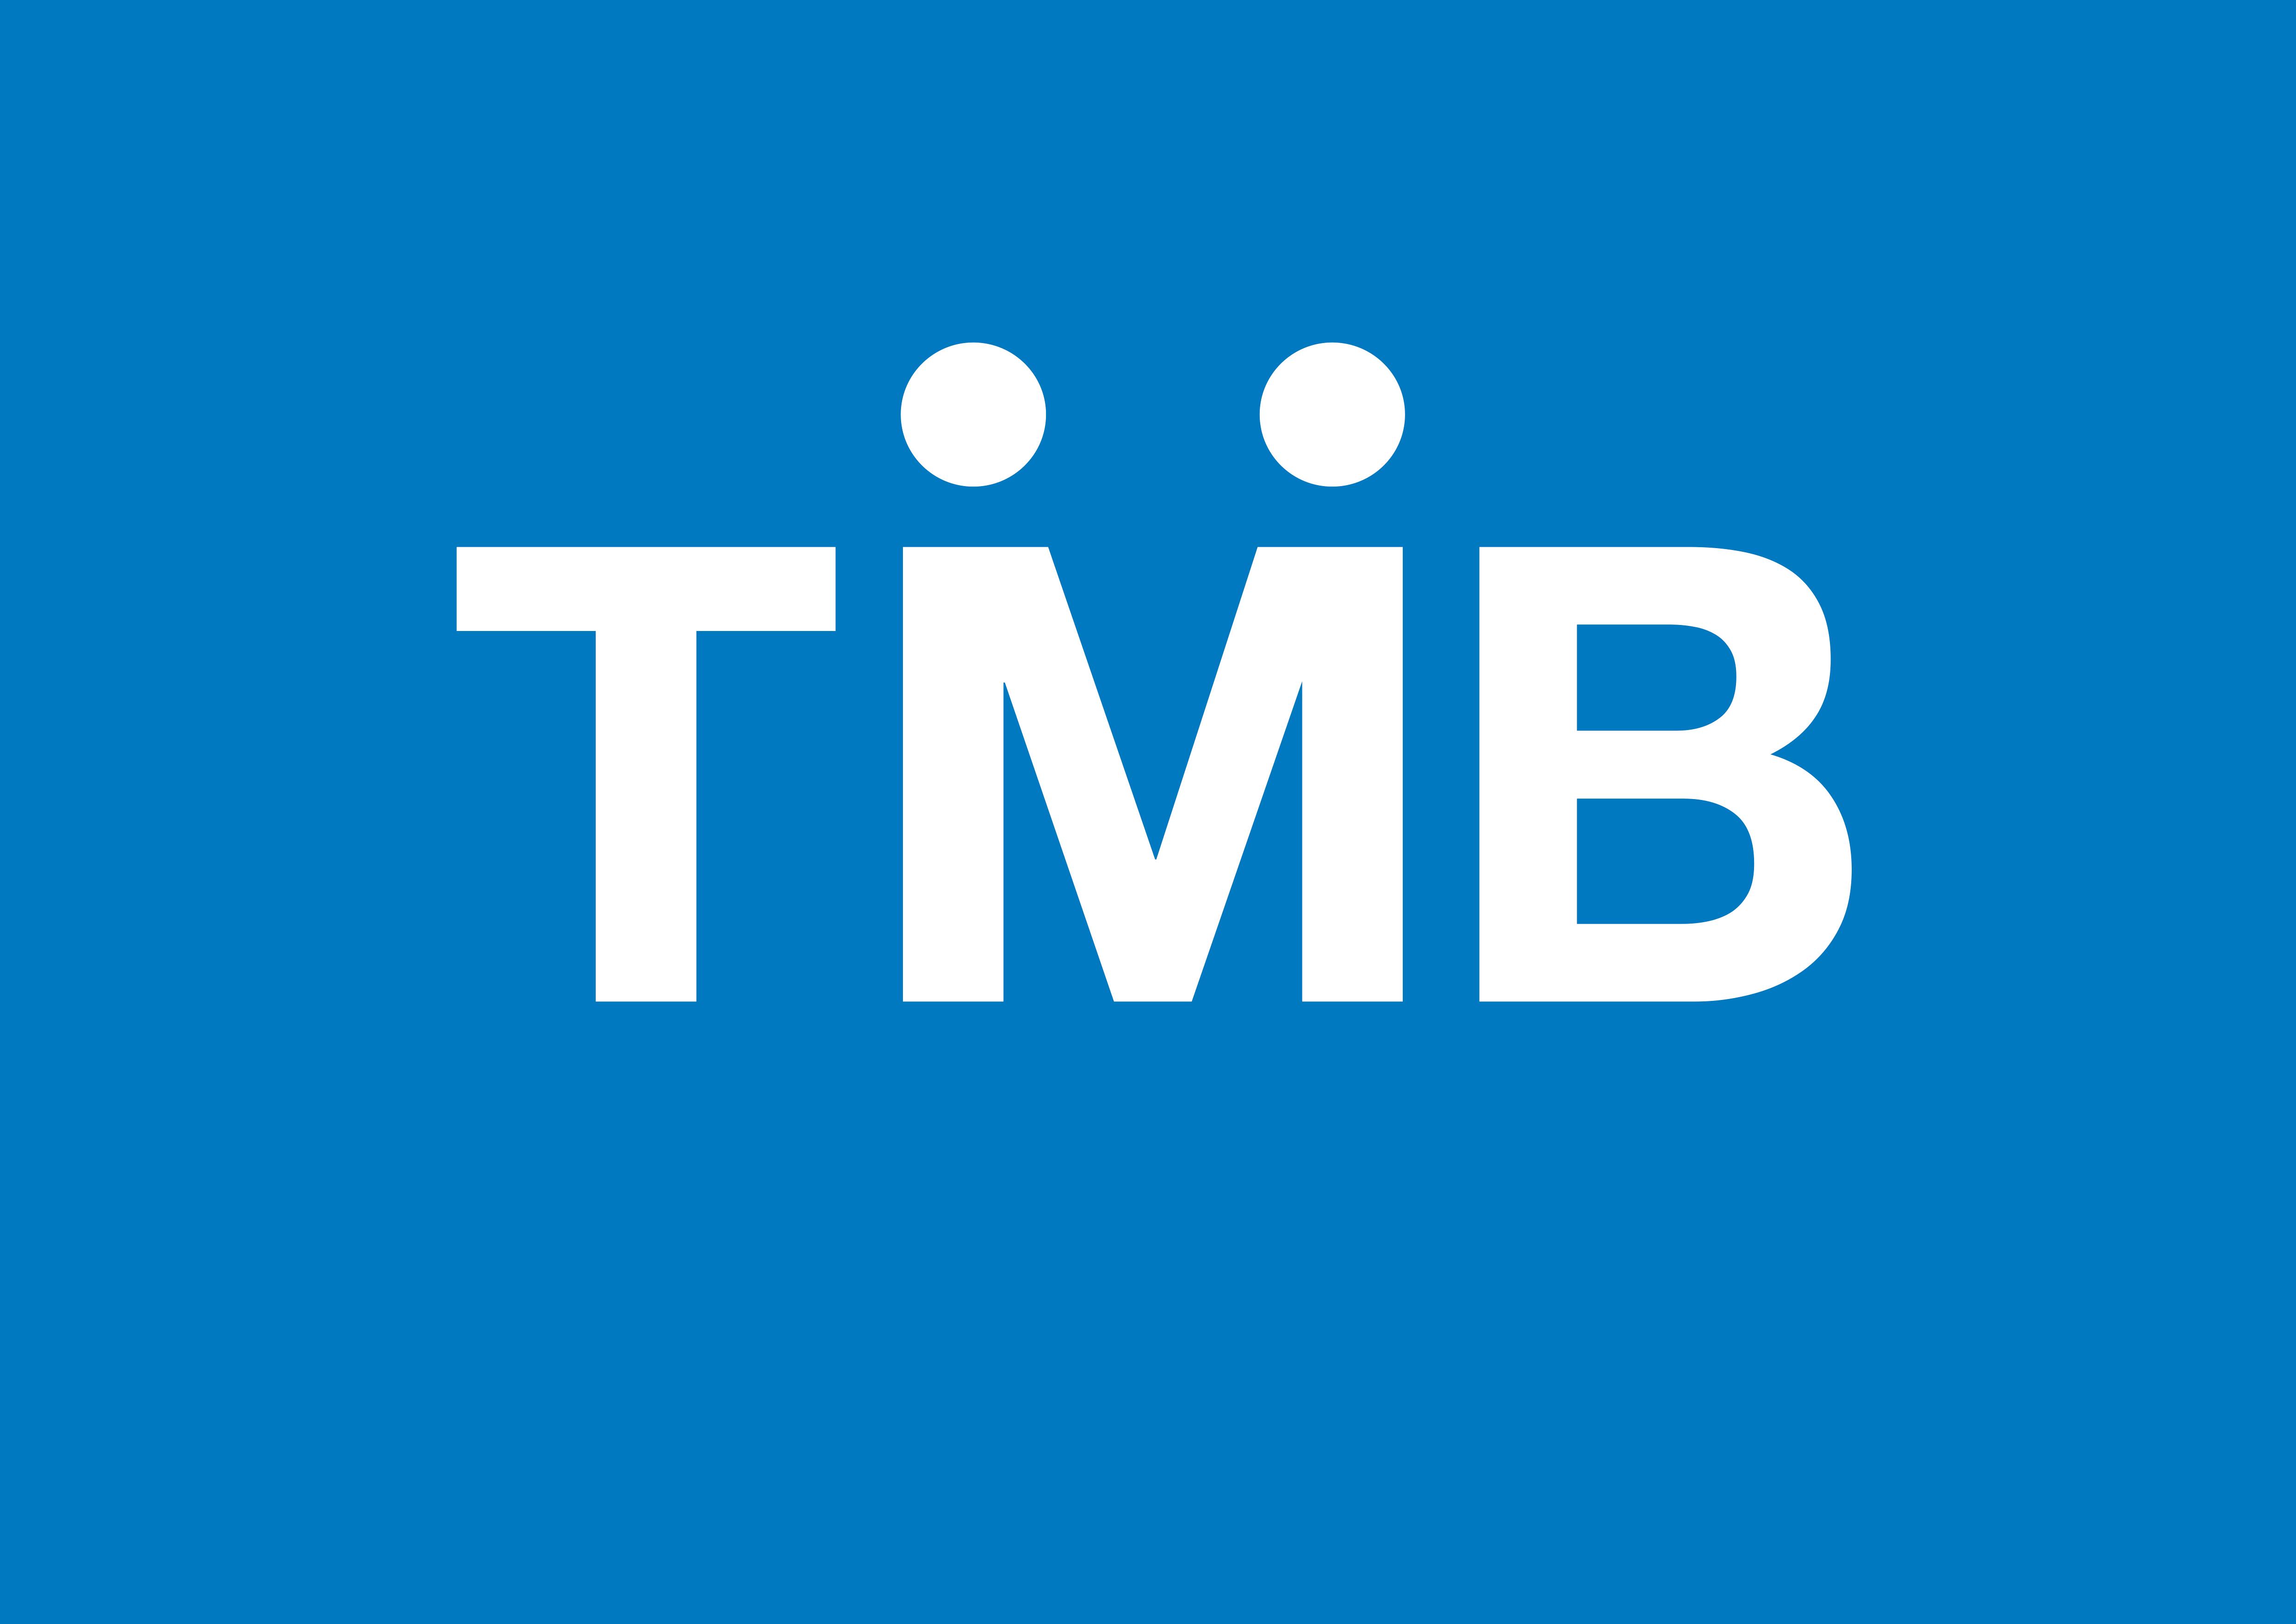 tmb logo ������������������������ �������� ���������